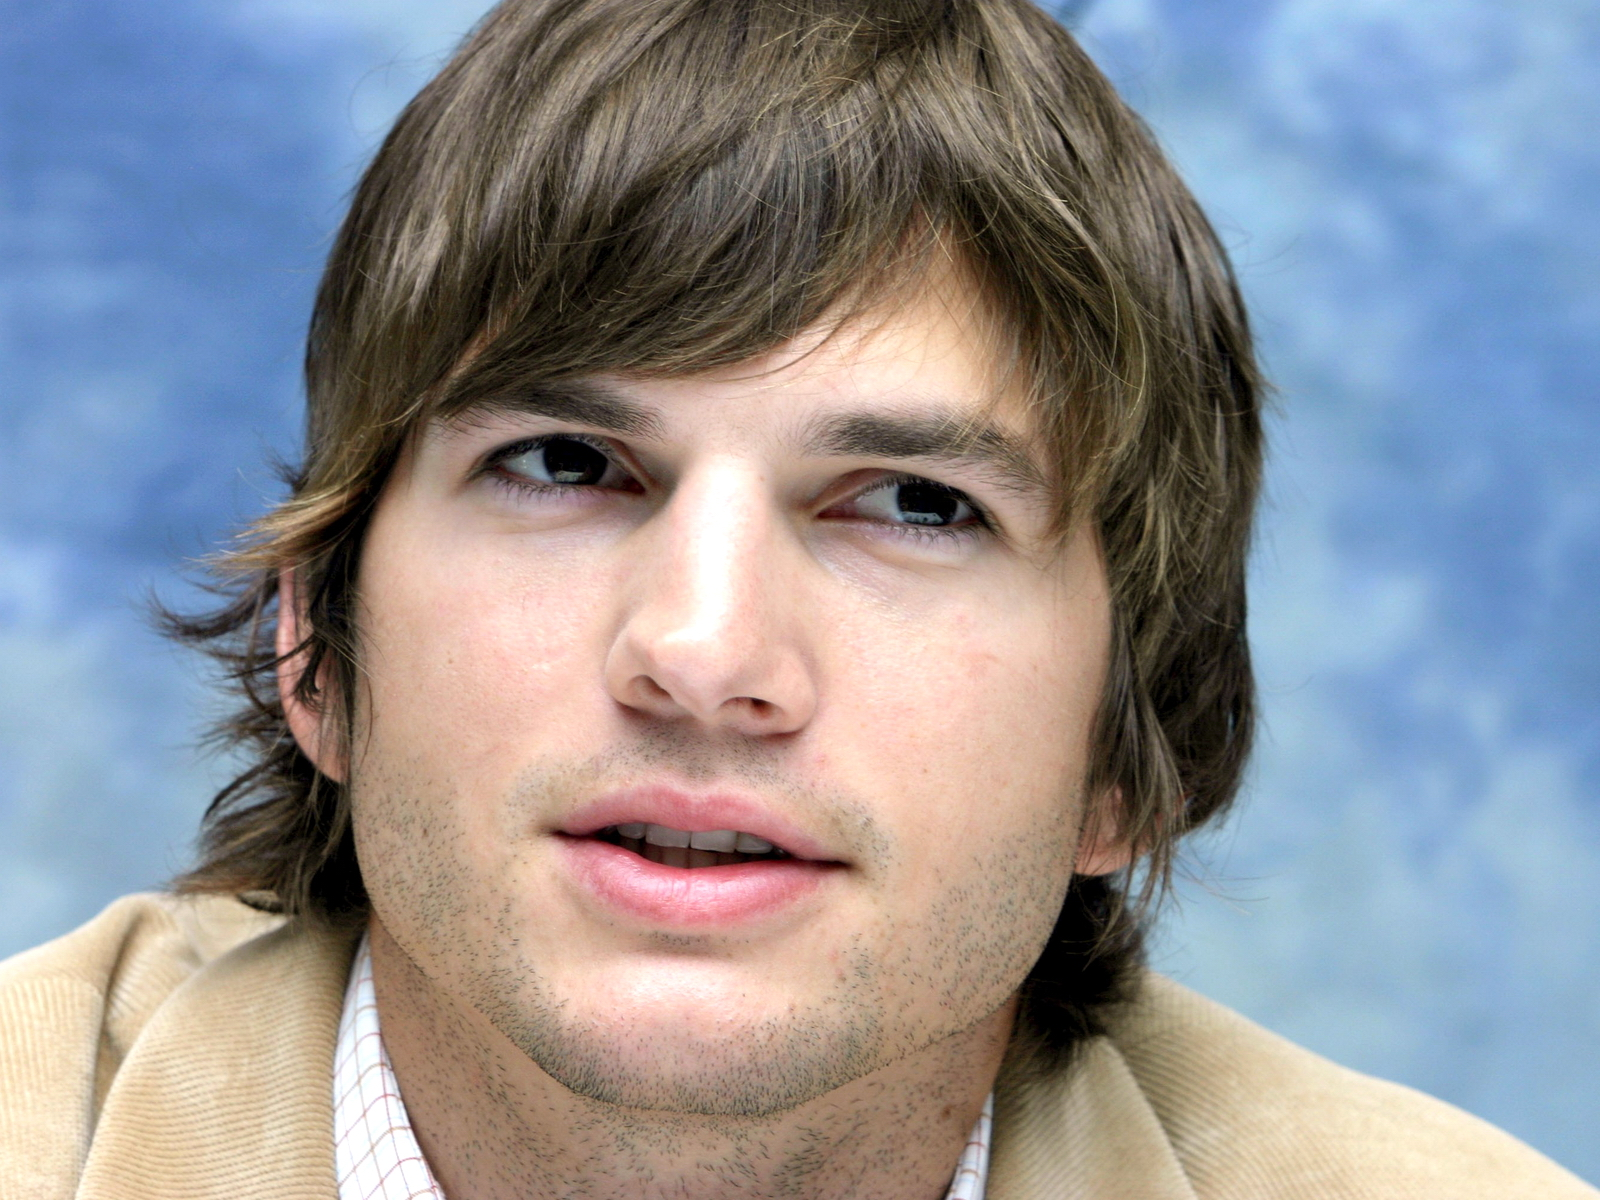 http://2.bp.blogspot.com/-l_-FZvQHK-w/T5lelw3s2gI/AAAAAAAAADE/uLM94Ns0L-w/s1600/Ashton+Kutcher+wallpapers+10.jpg